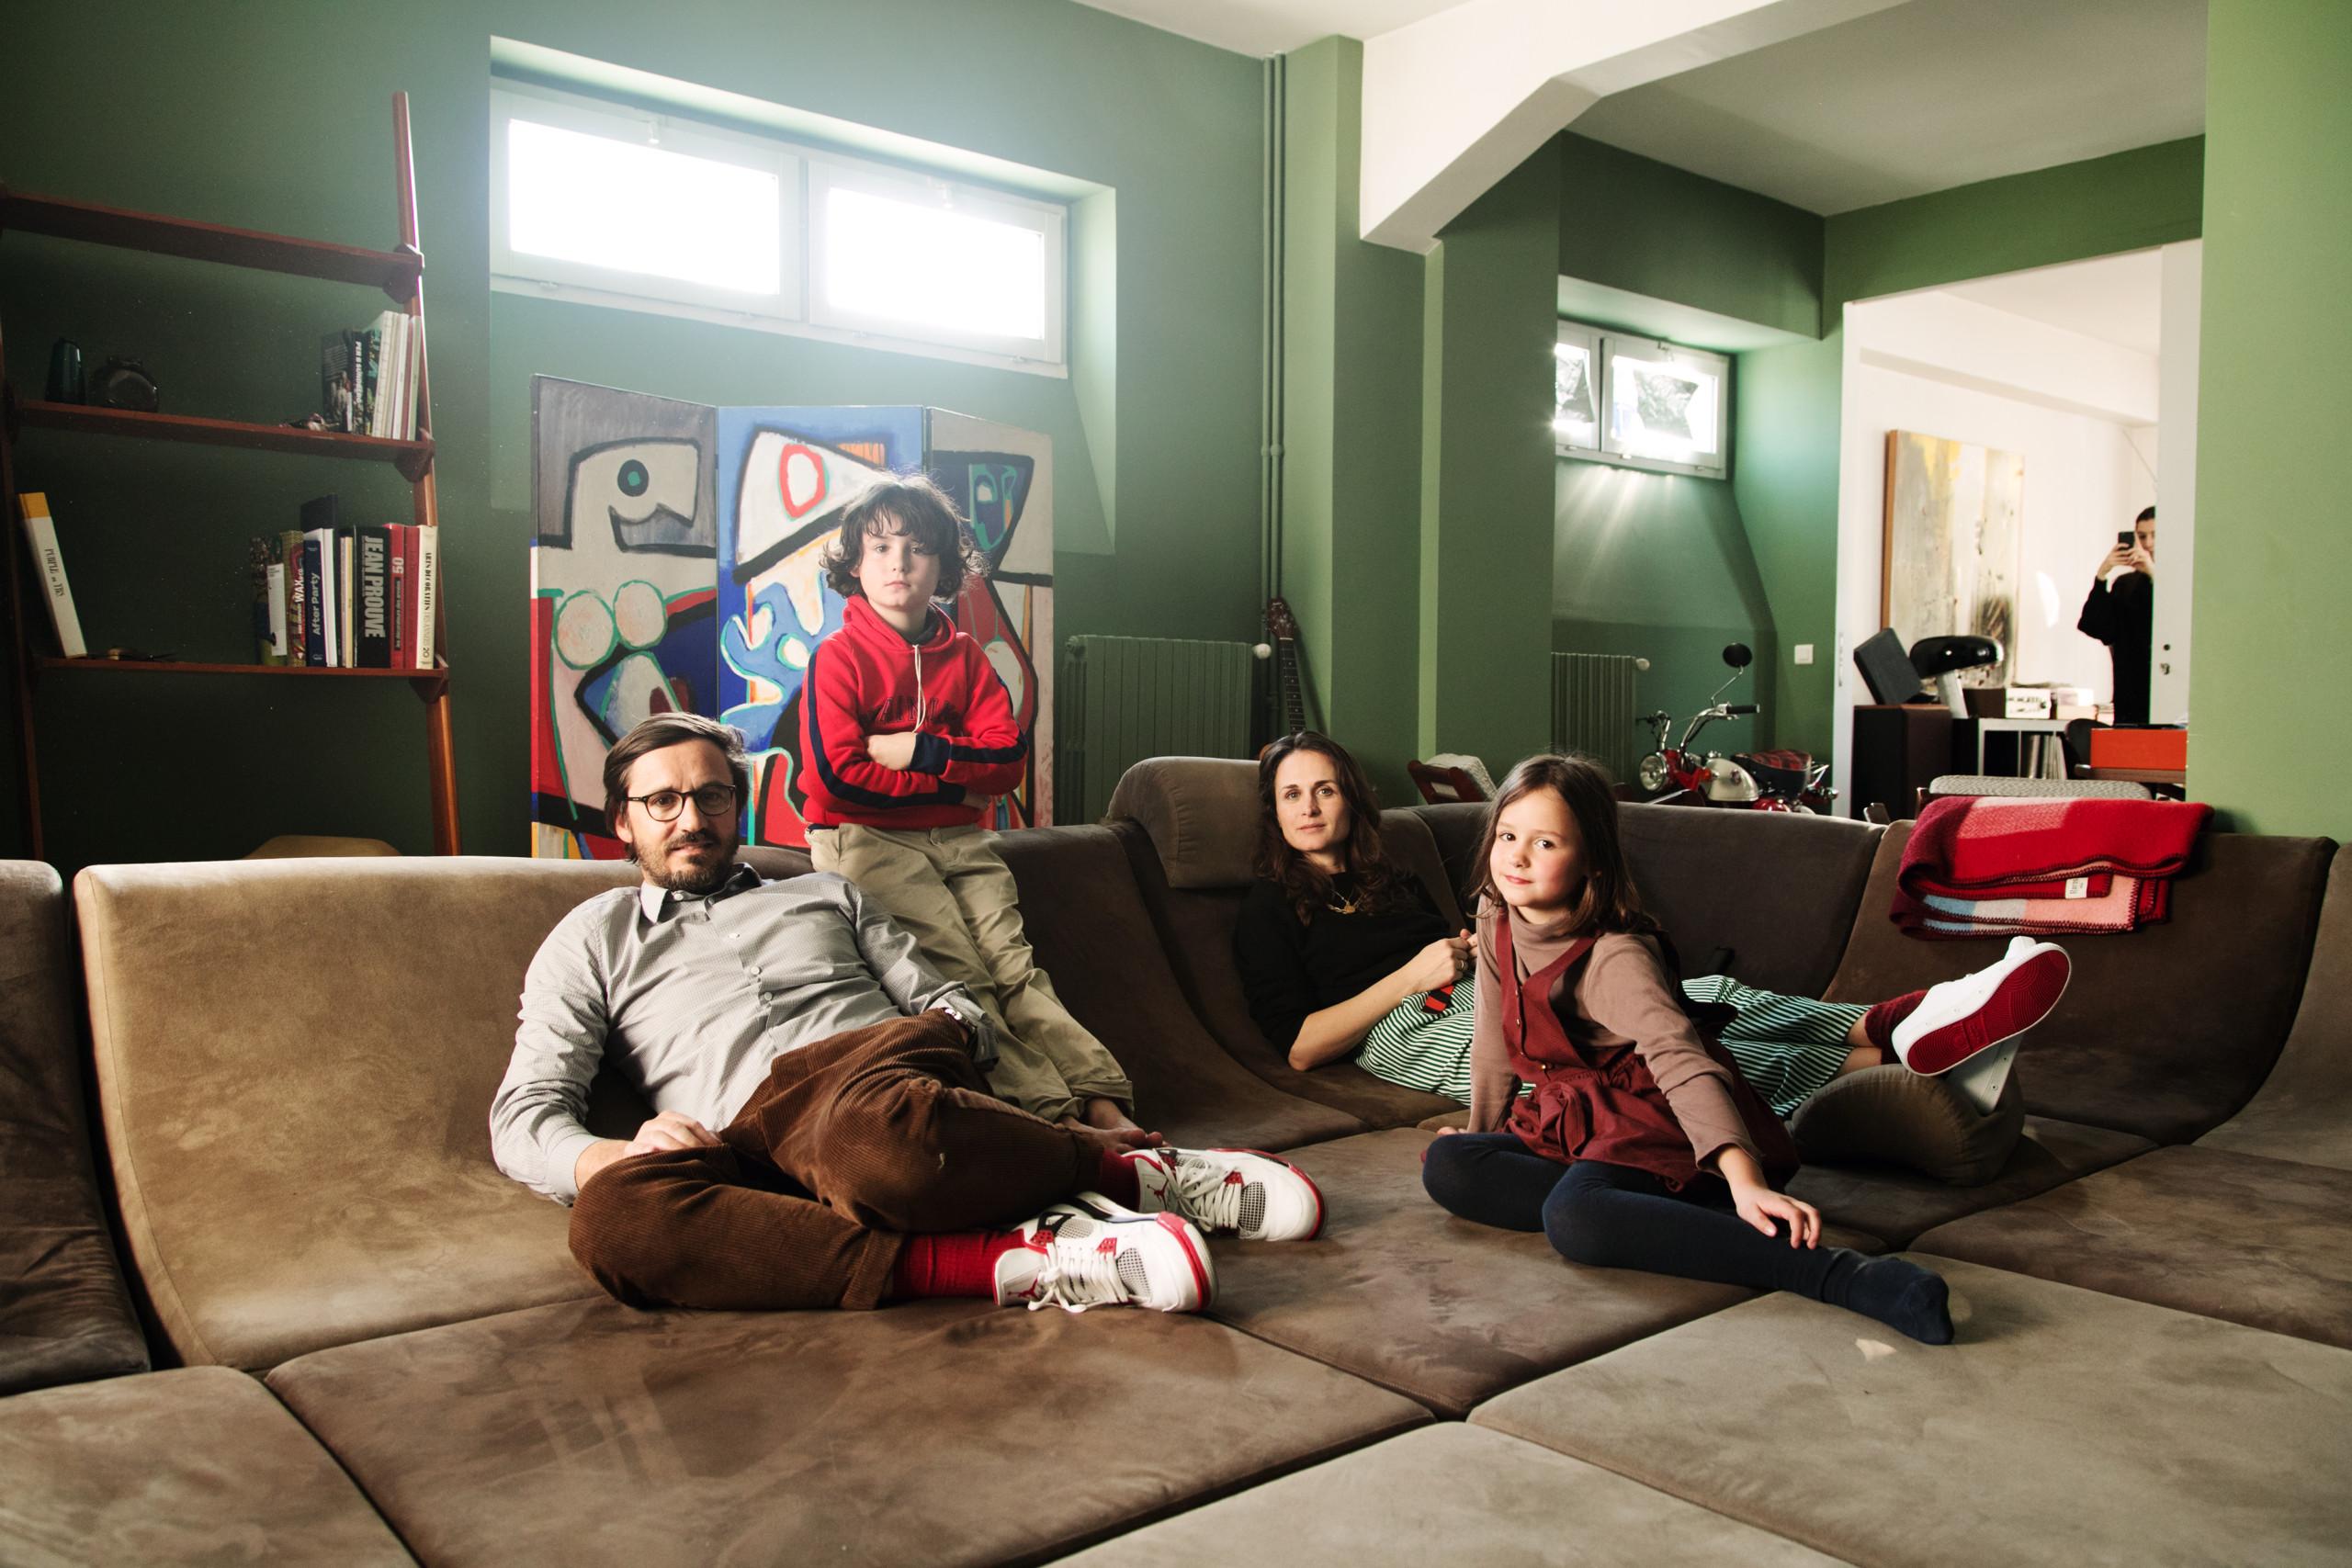 11 Design and Family Corner Sofas <br>Seen on The Socialite Family